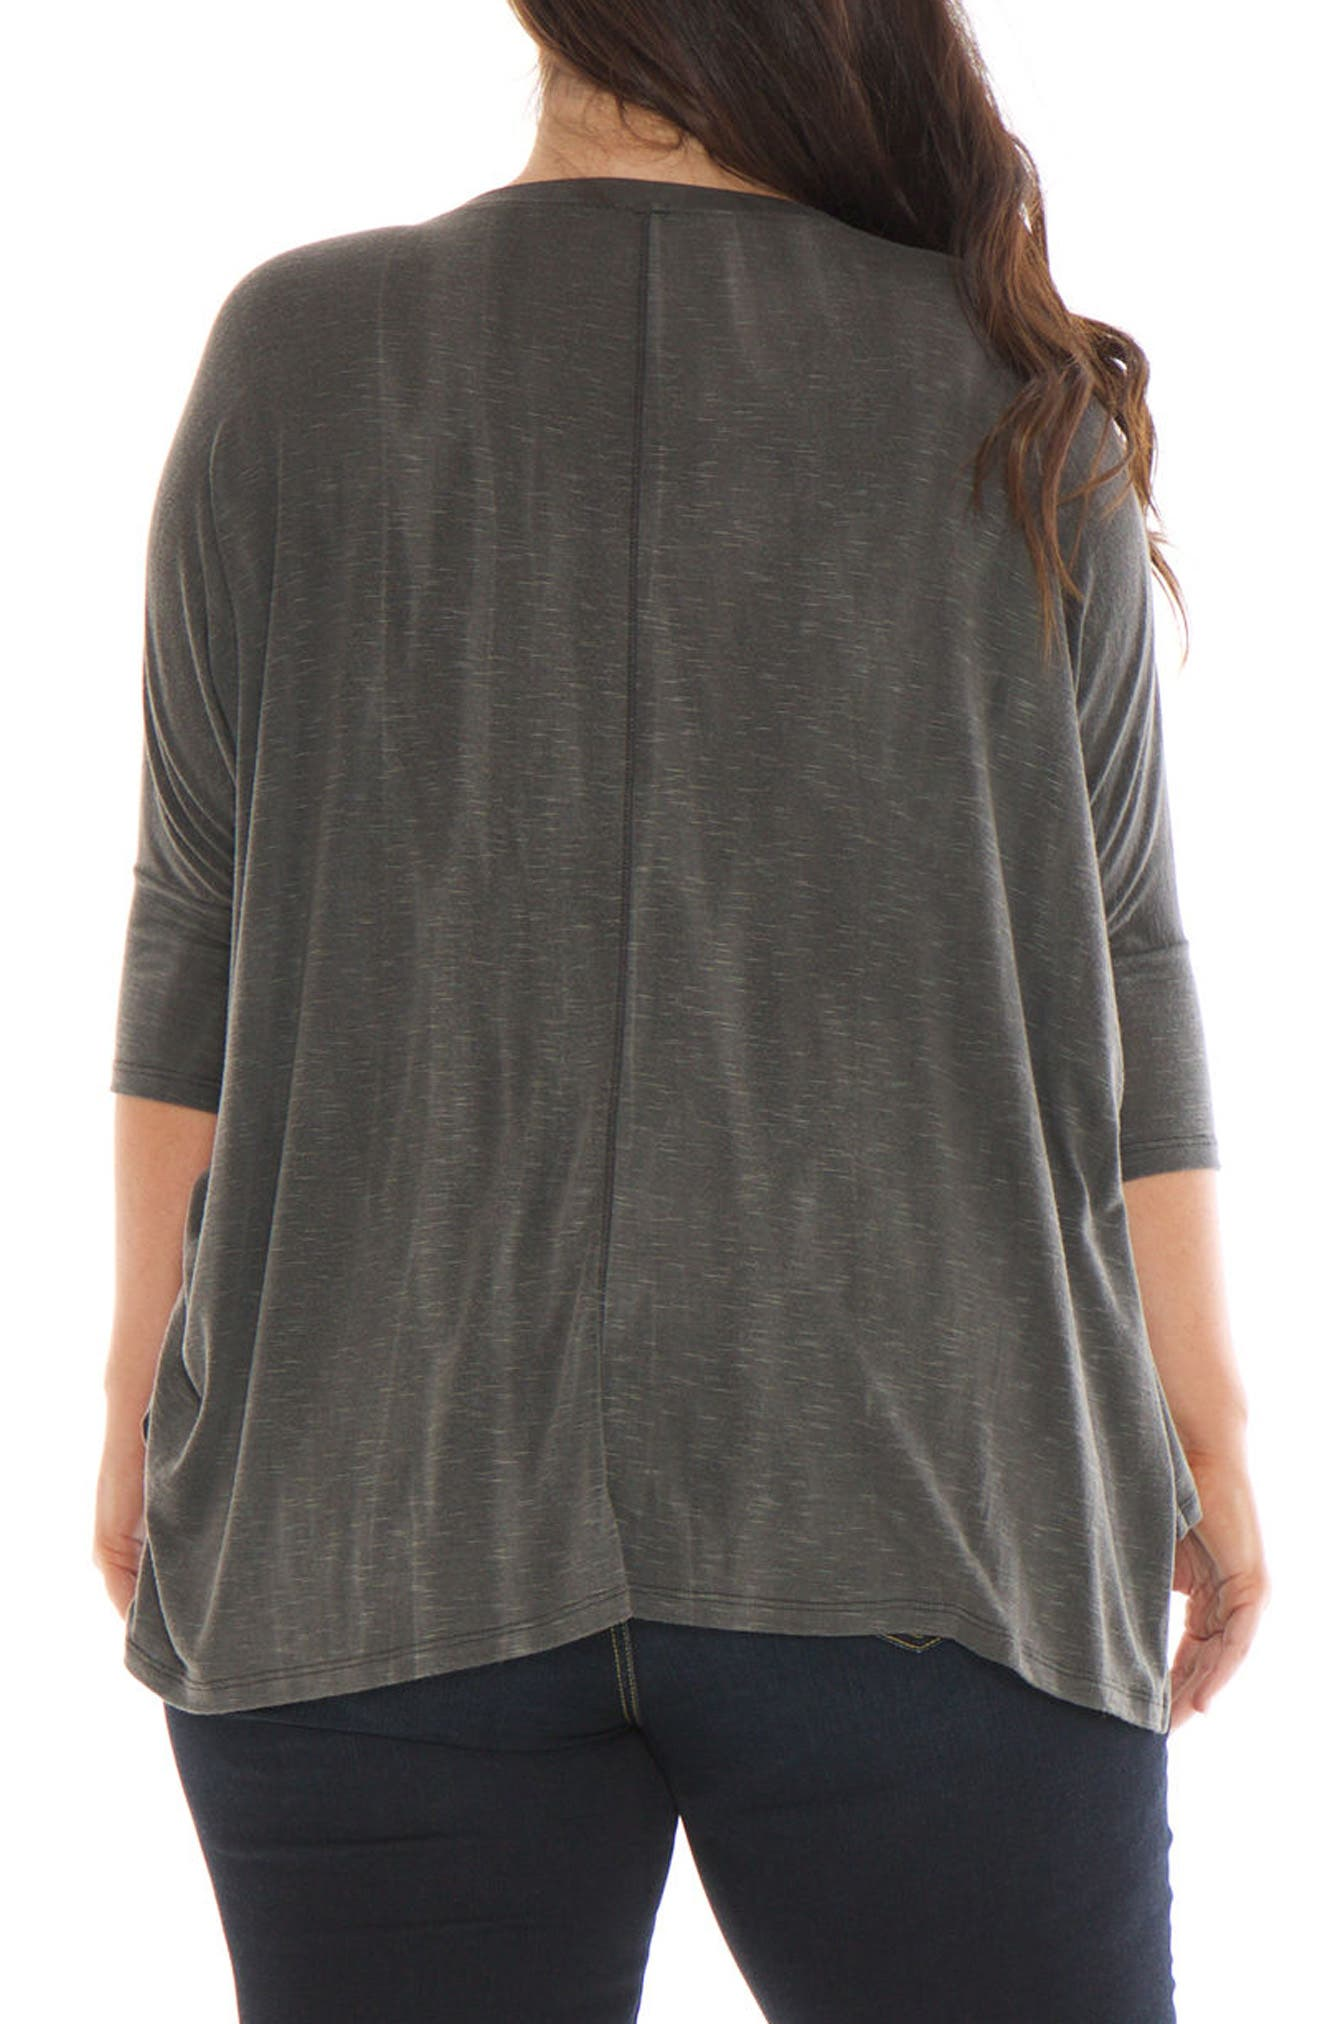 Alternate Image 2  - SLINK Jeans Oversized V-Neck Top (Plus Size)